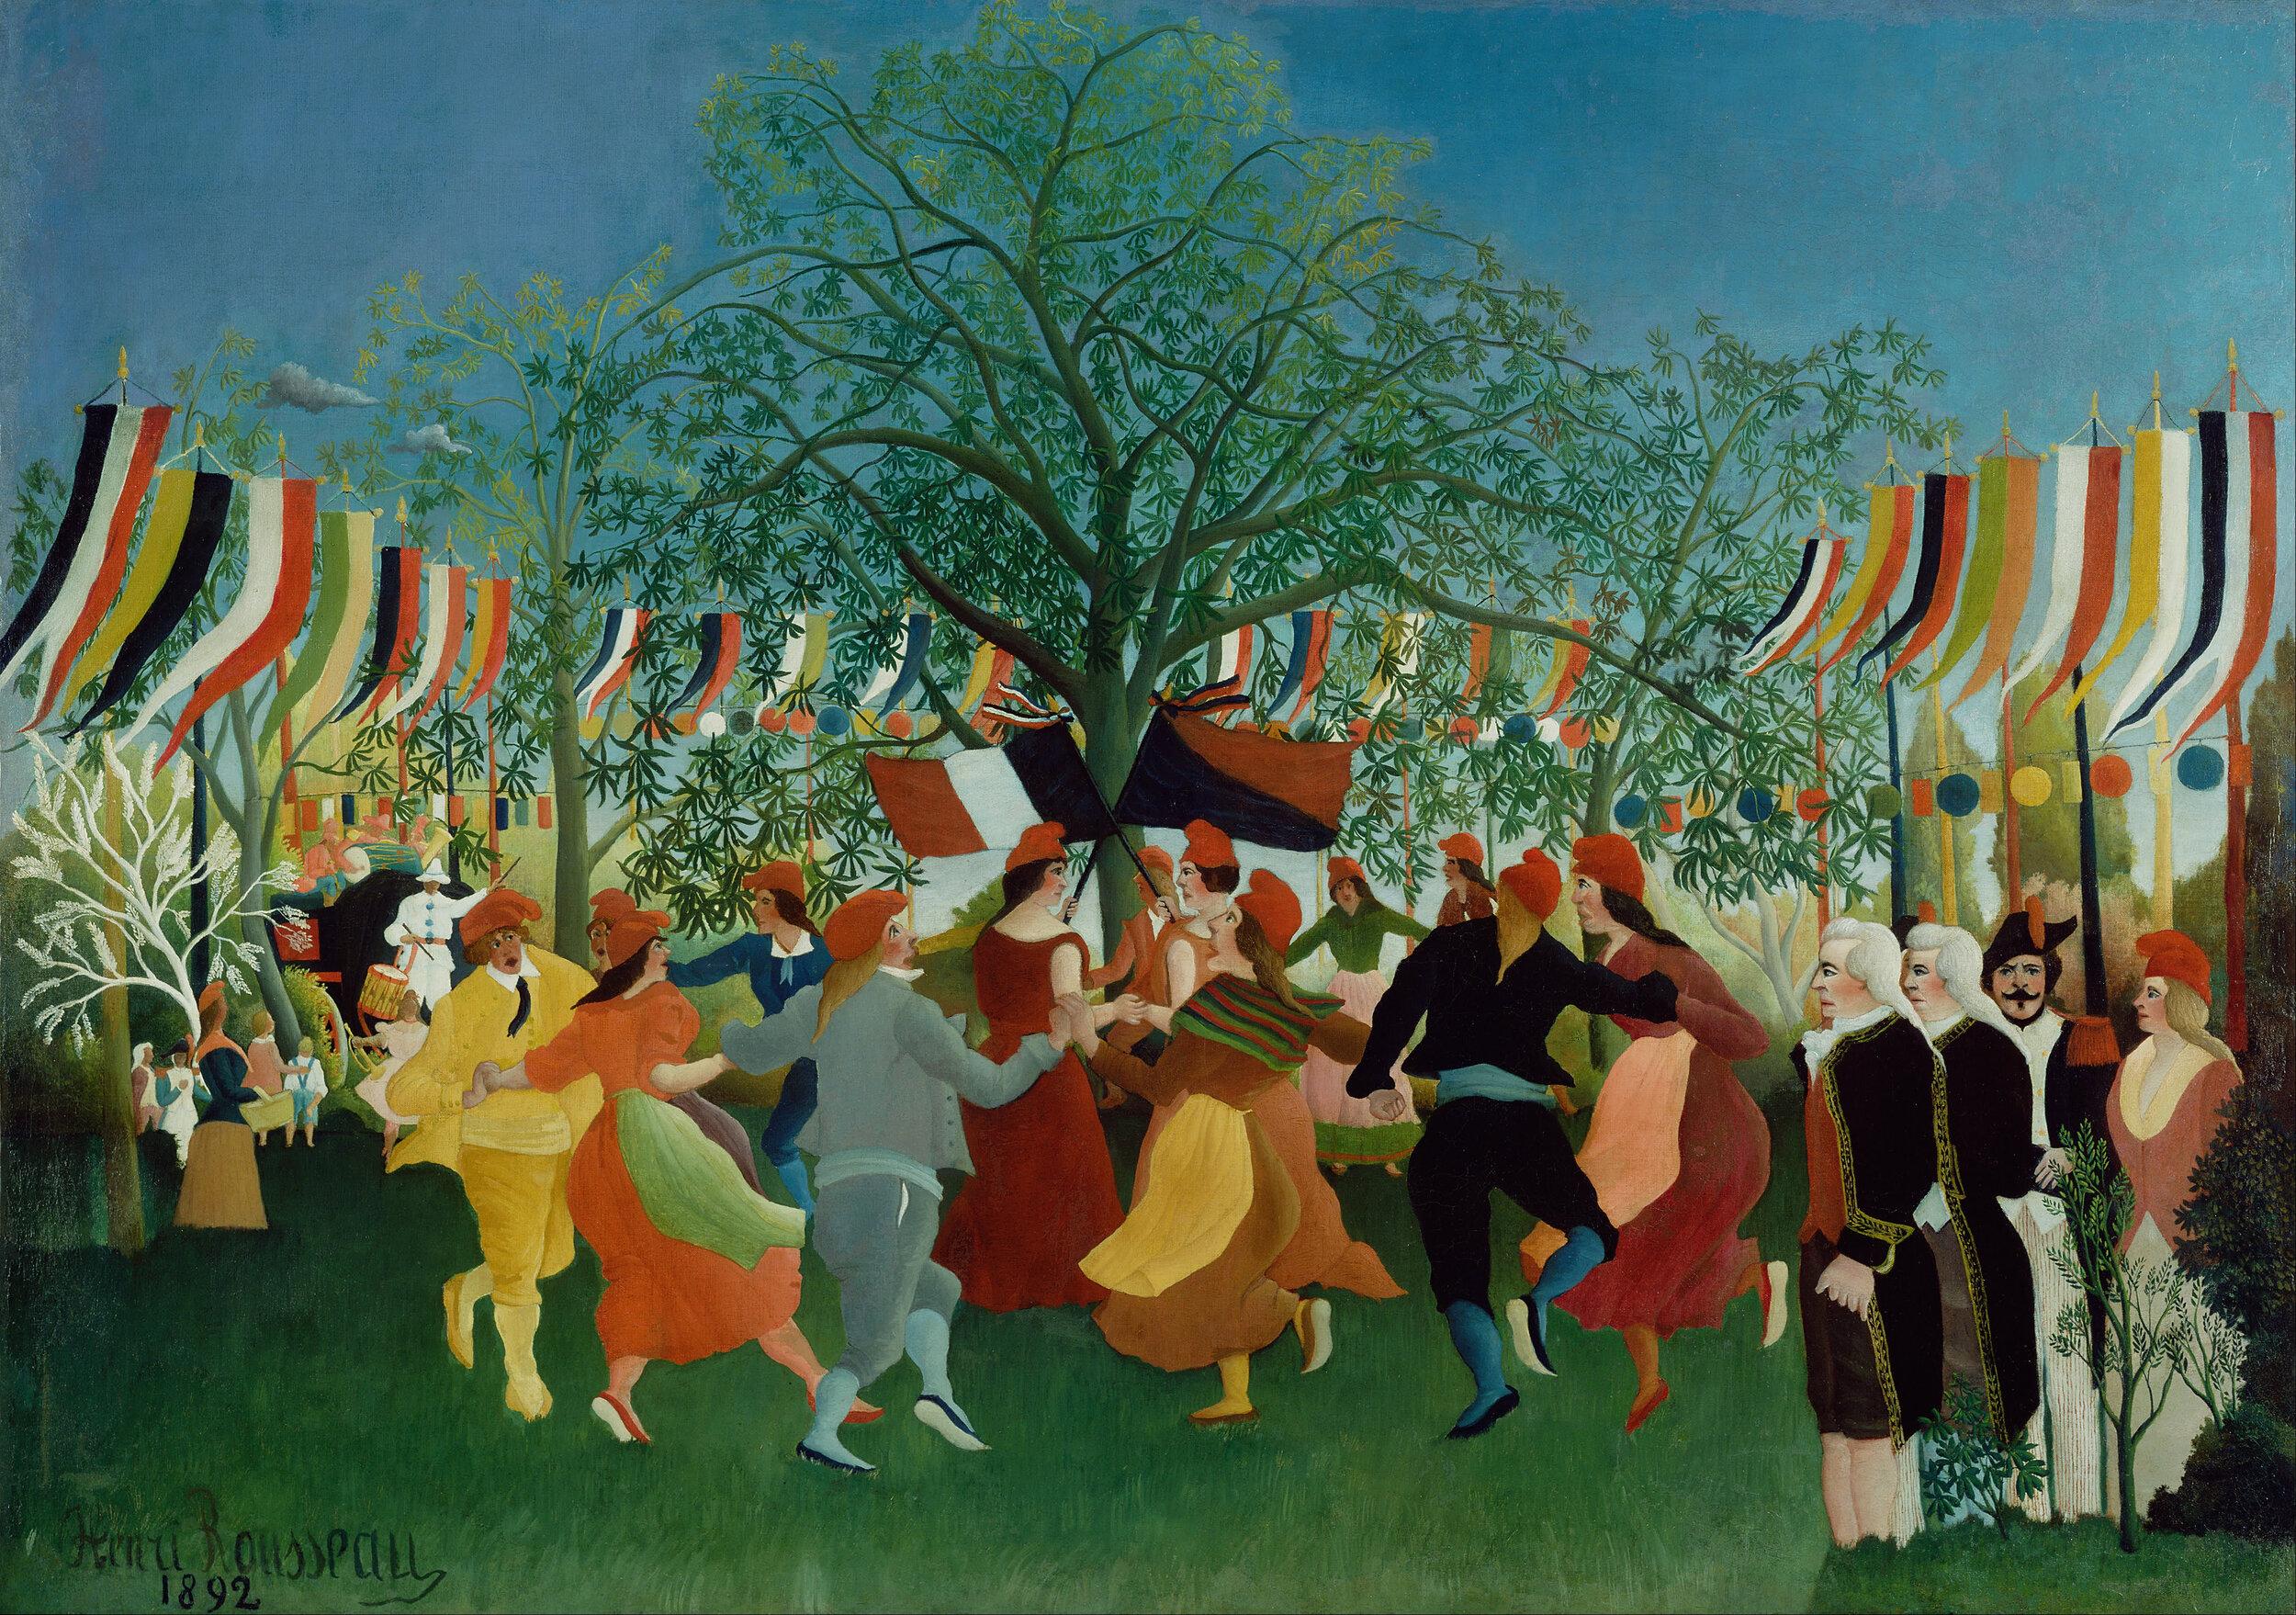 Henri_Rousseau_(French)_-_A_Centennial_of_Independence_-_Google_Art_Project.jpg